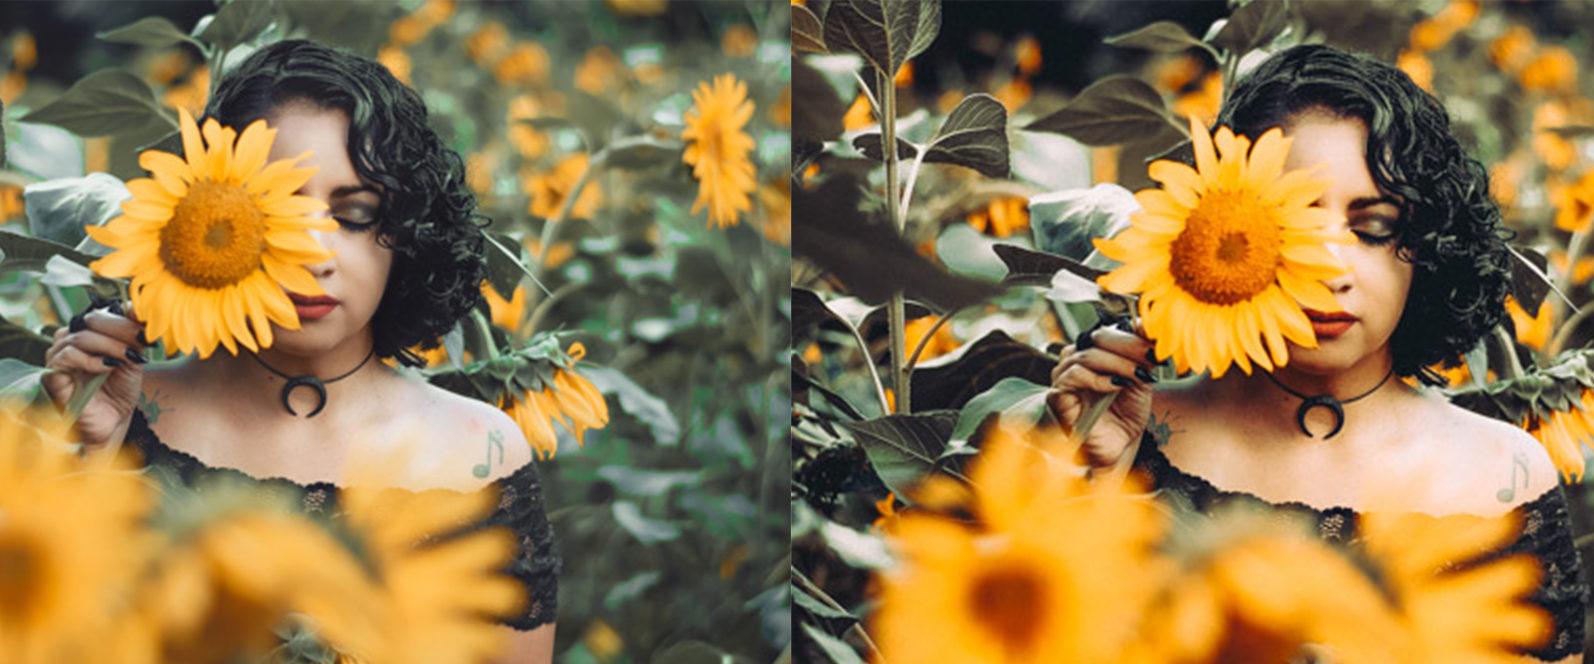 12 x Sunflower Fields Lightroom Presets   Warm Lightroom Presets   Yellow Presets - 6 Sunflower Fields -